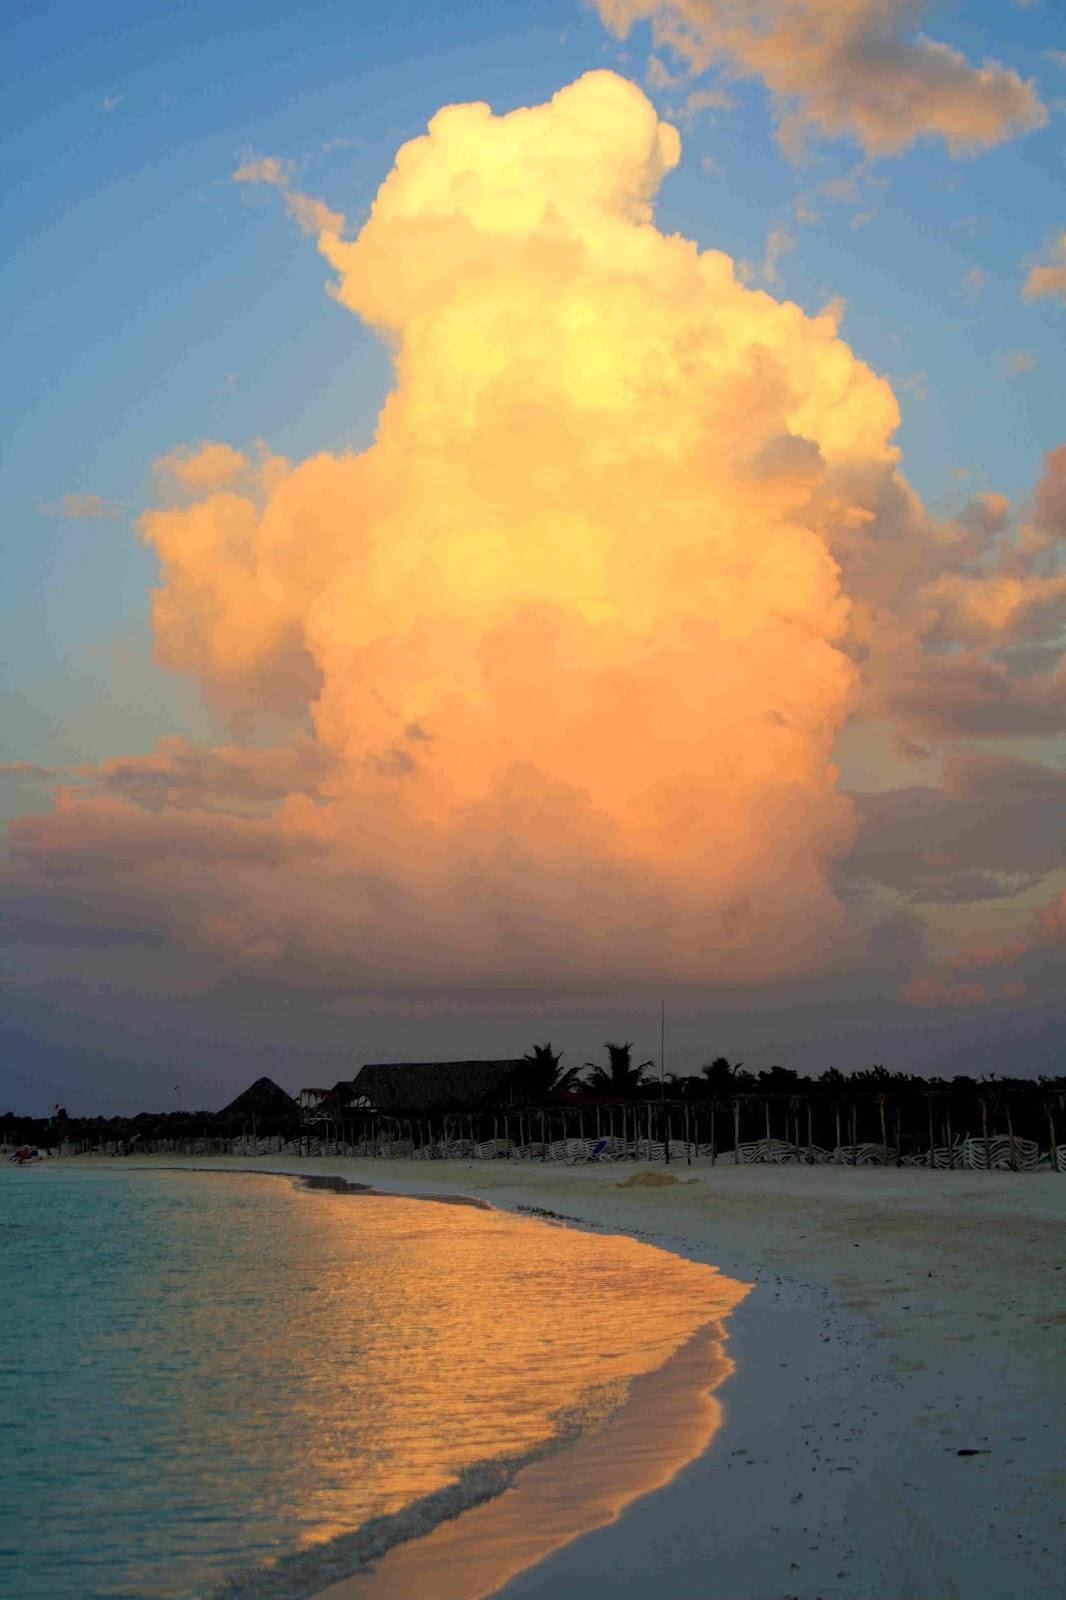 Iberostar Ensenachos; review; Iberostar; Cuba; travel; playa mengano